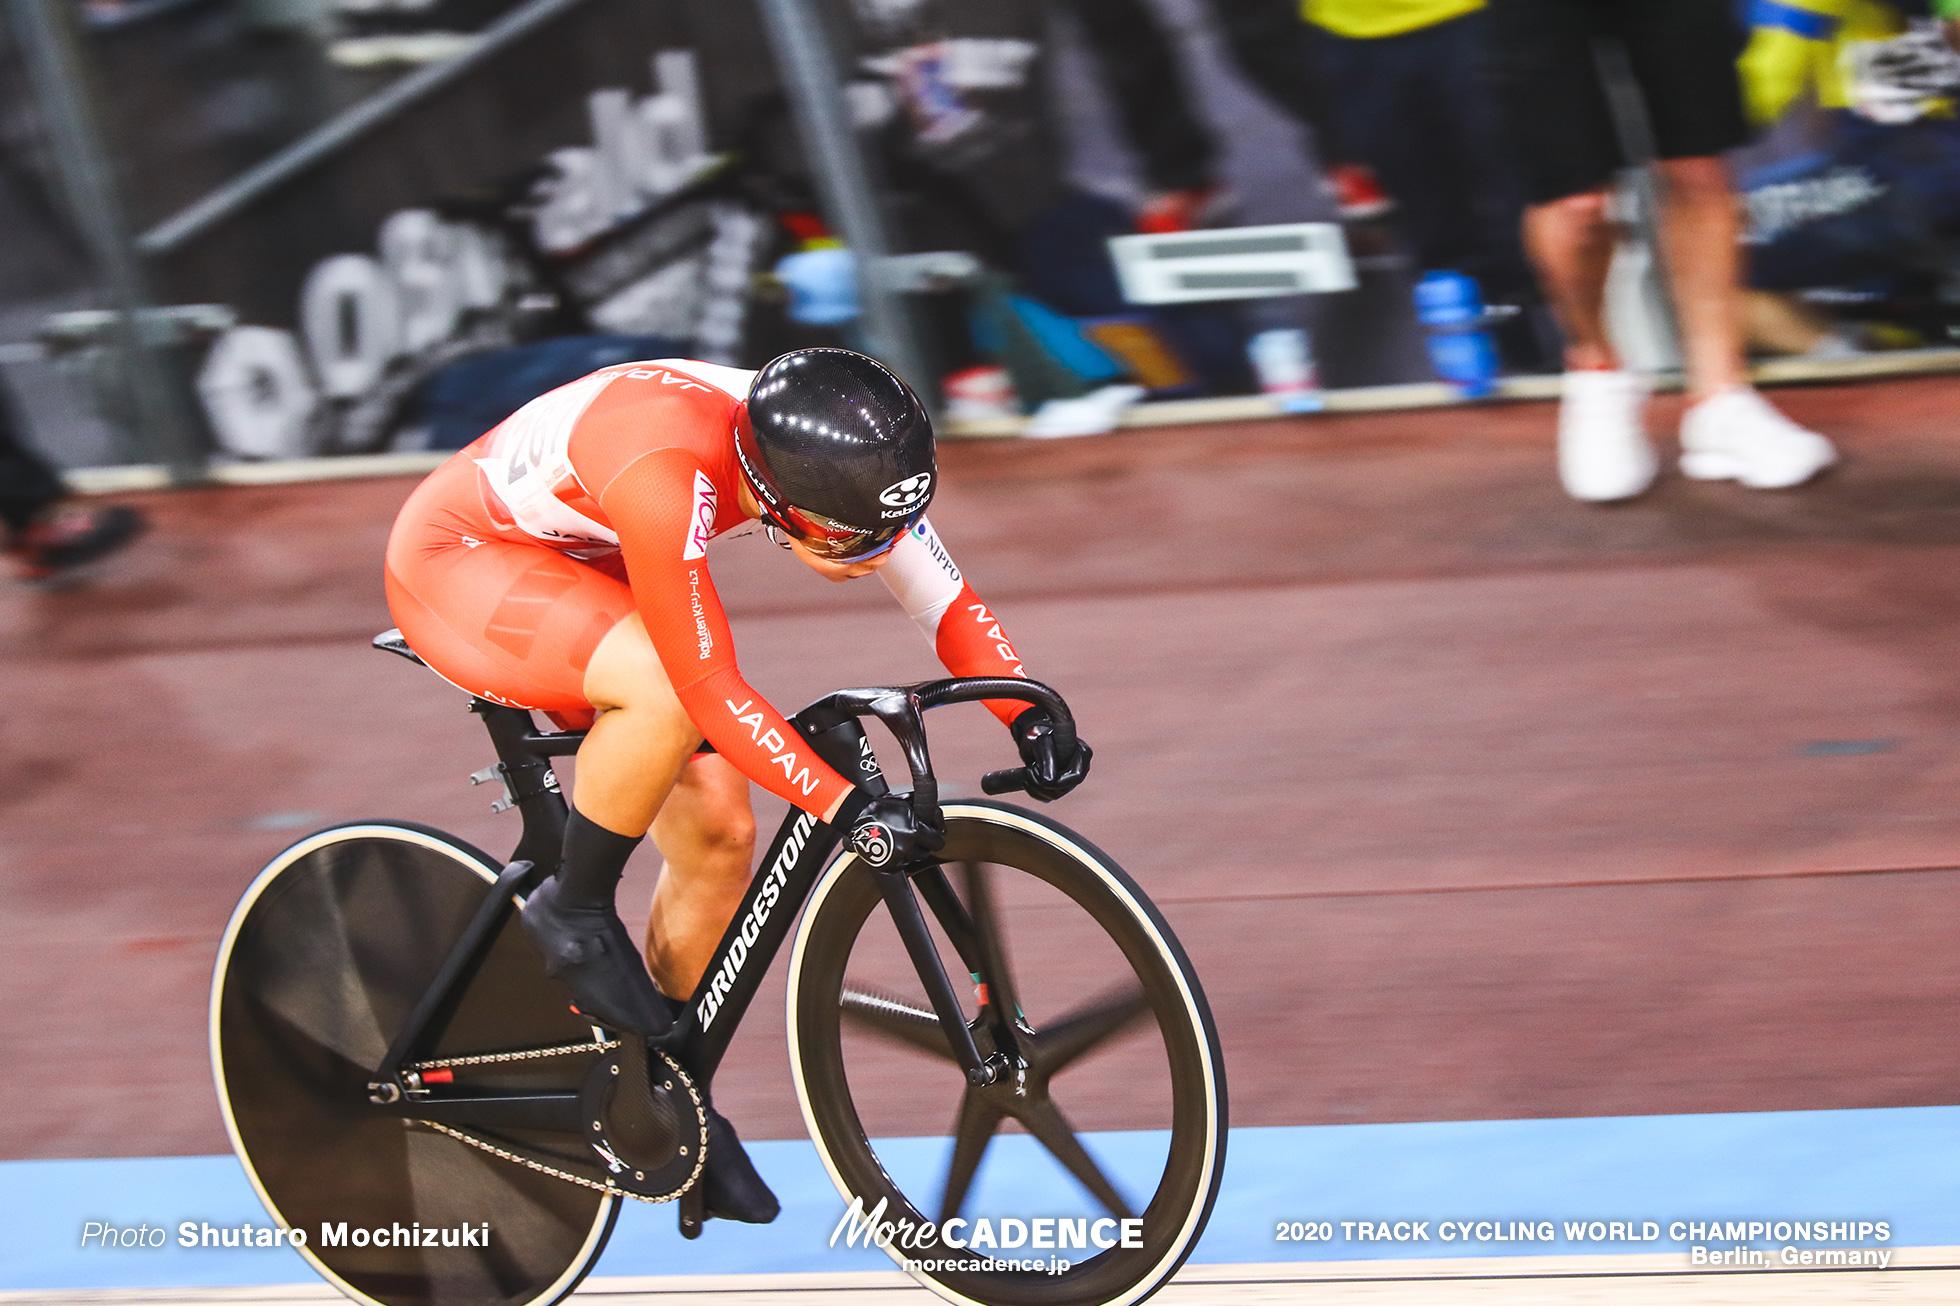 1st Round / Women's Keirin / 2020 Track Cycling World Championships, Ohta Riyu 太田りゆ